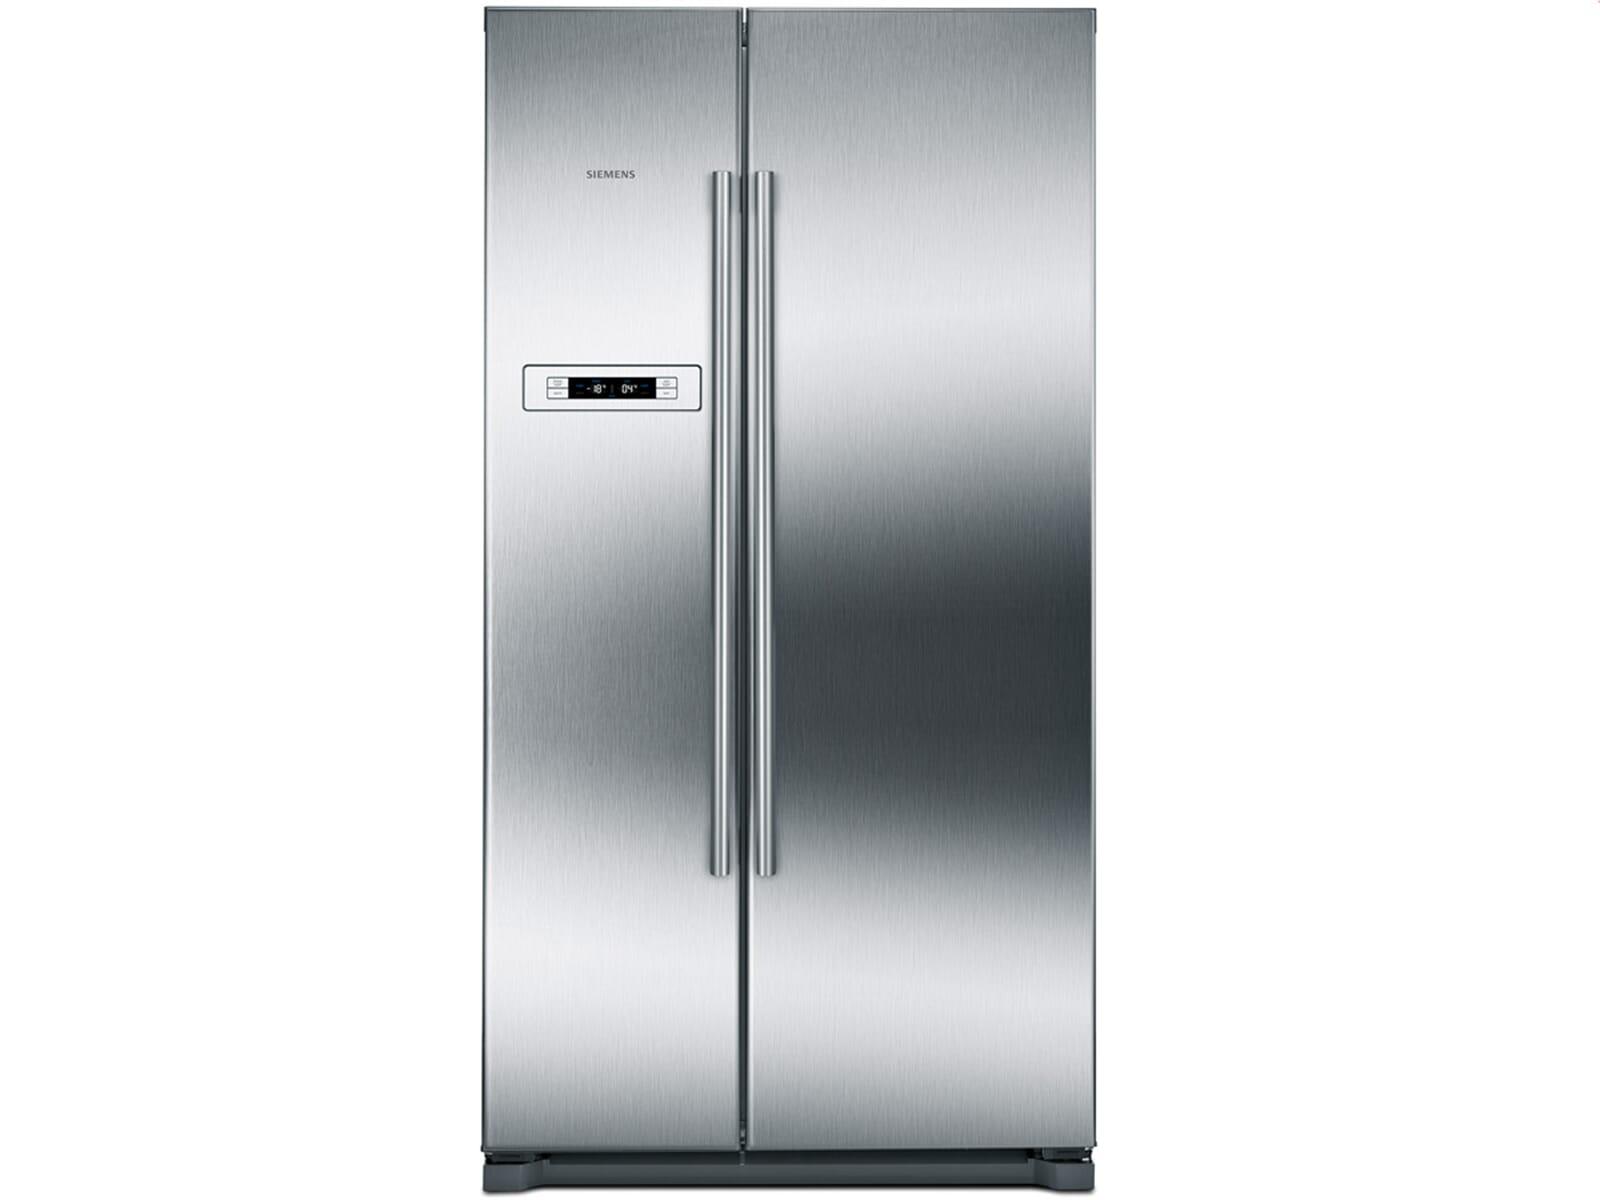 Retro Kühlschrank Amerikanisch : Siemens ka90nvi20 side by side kühl gefrier kombination edelstahl